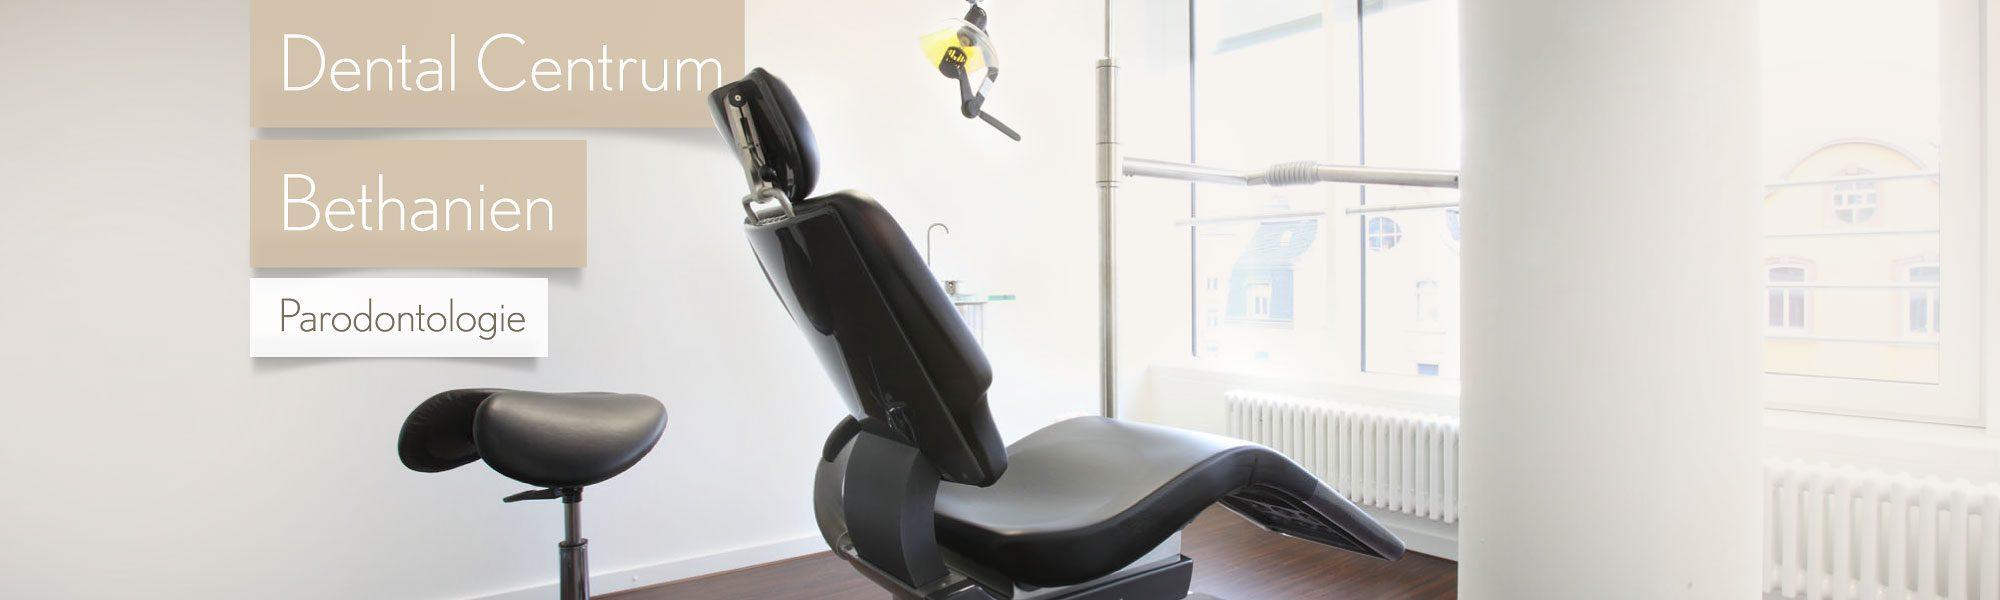 Parodontitis bei Groisman & Laube in Frankfurt behandeln lassen